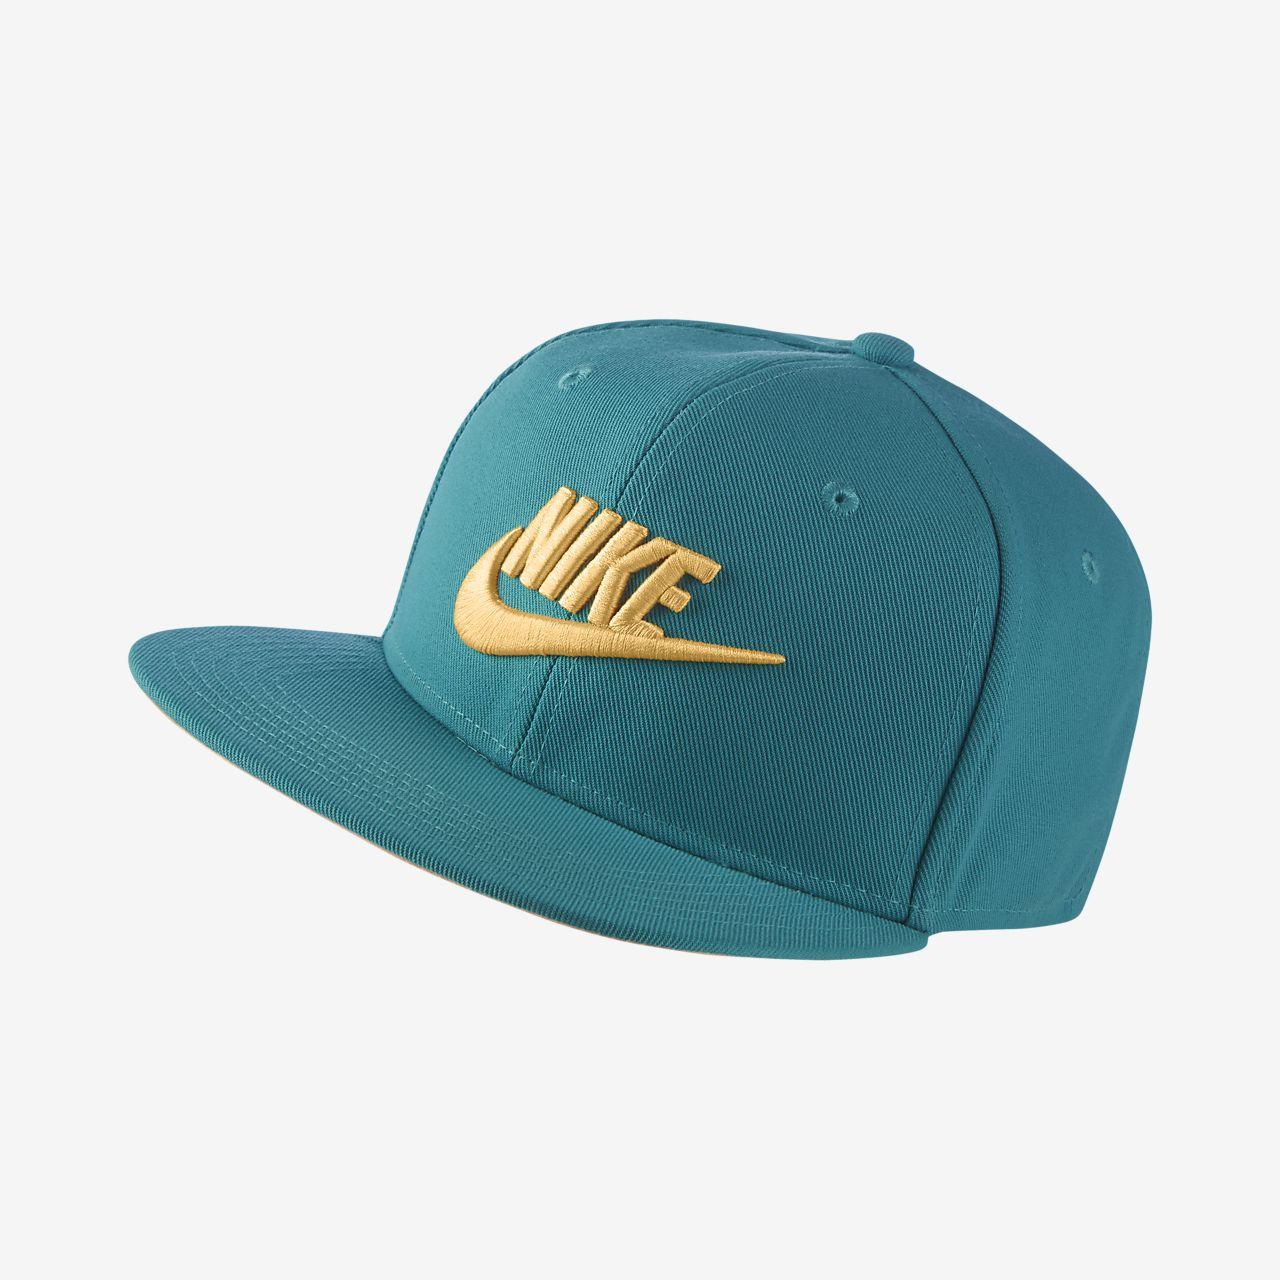 Nike Pro Gorra regulable - Niño/a